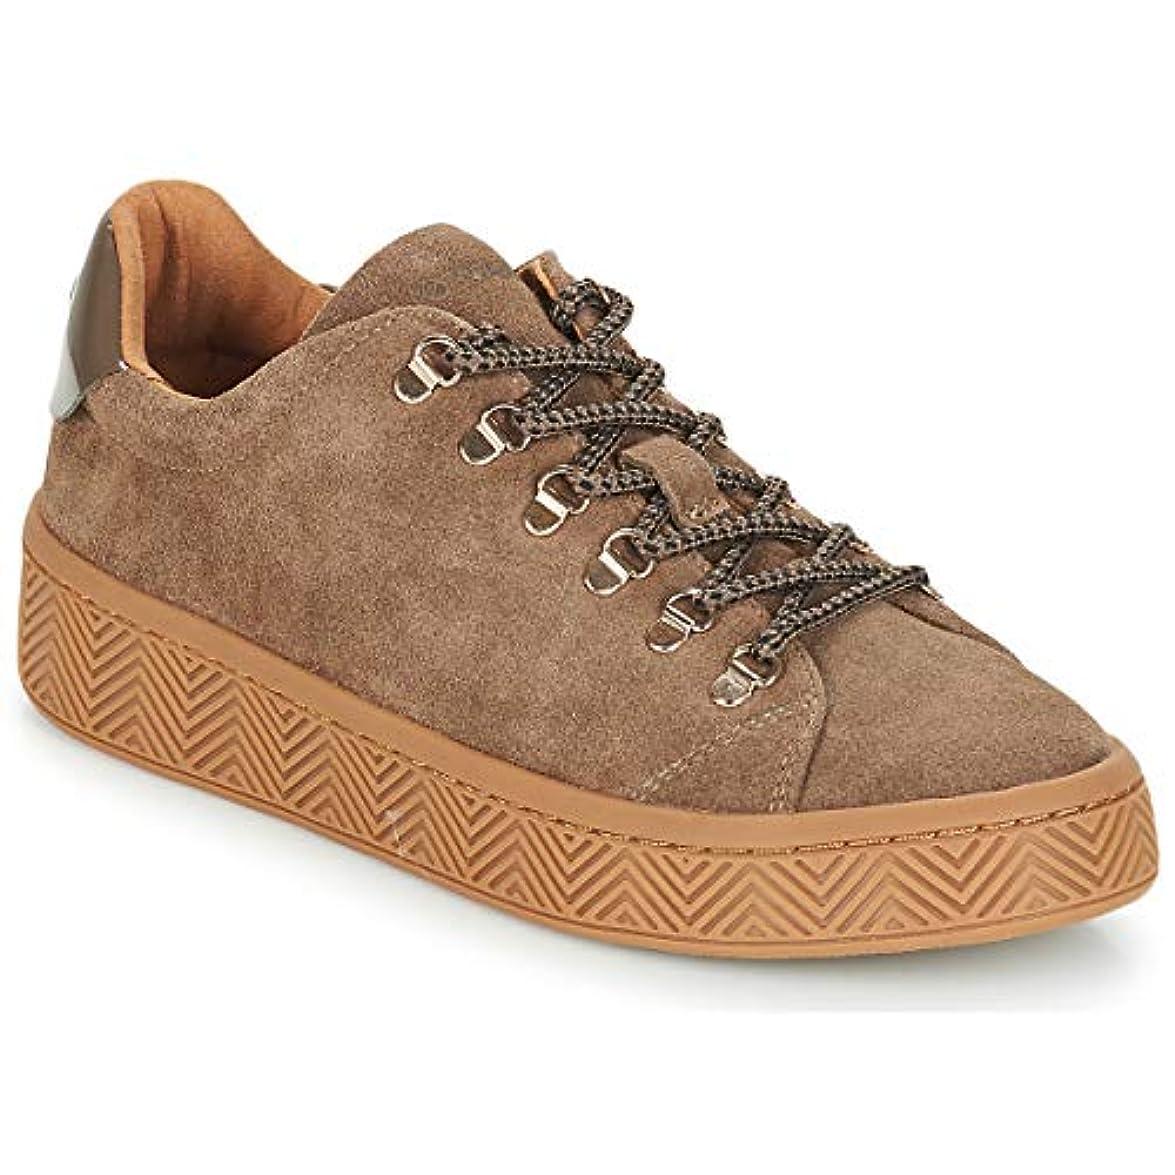 Noname Ginger Sneaker Sneakers Donne Marrone 39 Basse